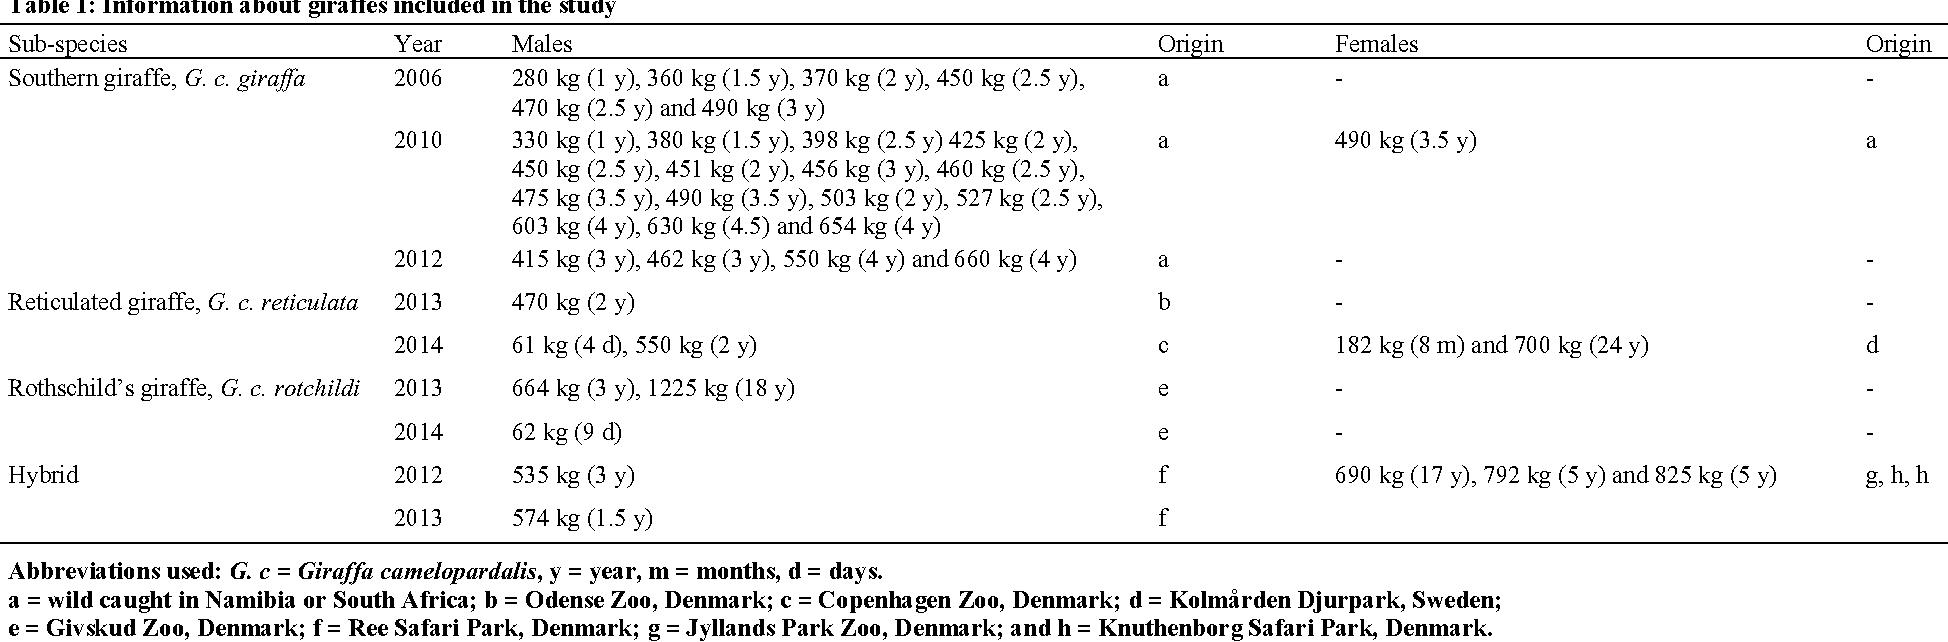 Table 1 from Quantitative Macroscopic Anatomy of the Giraffe ...